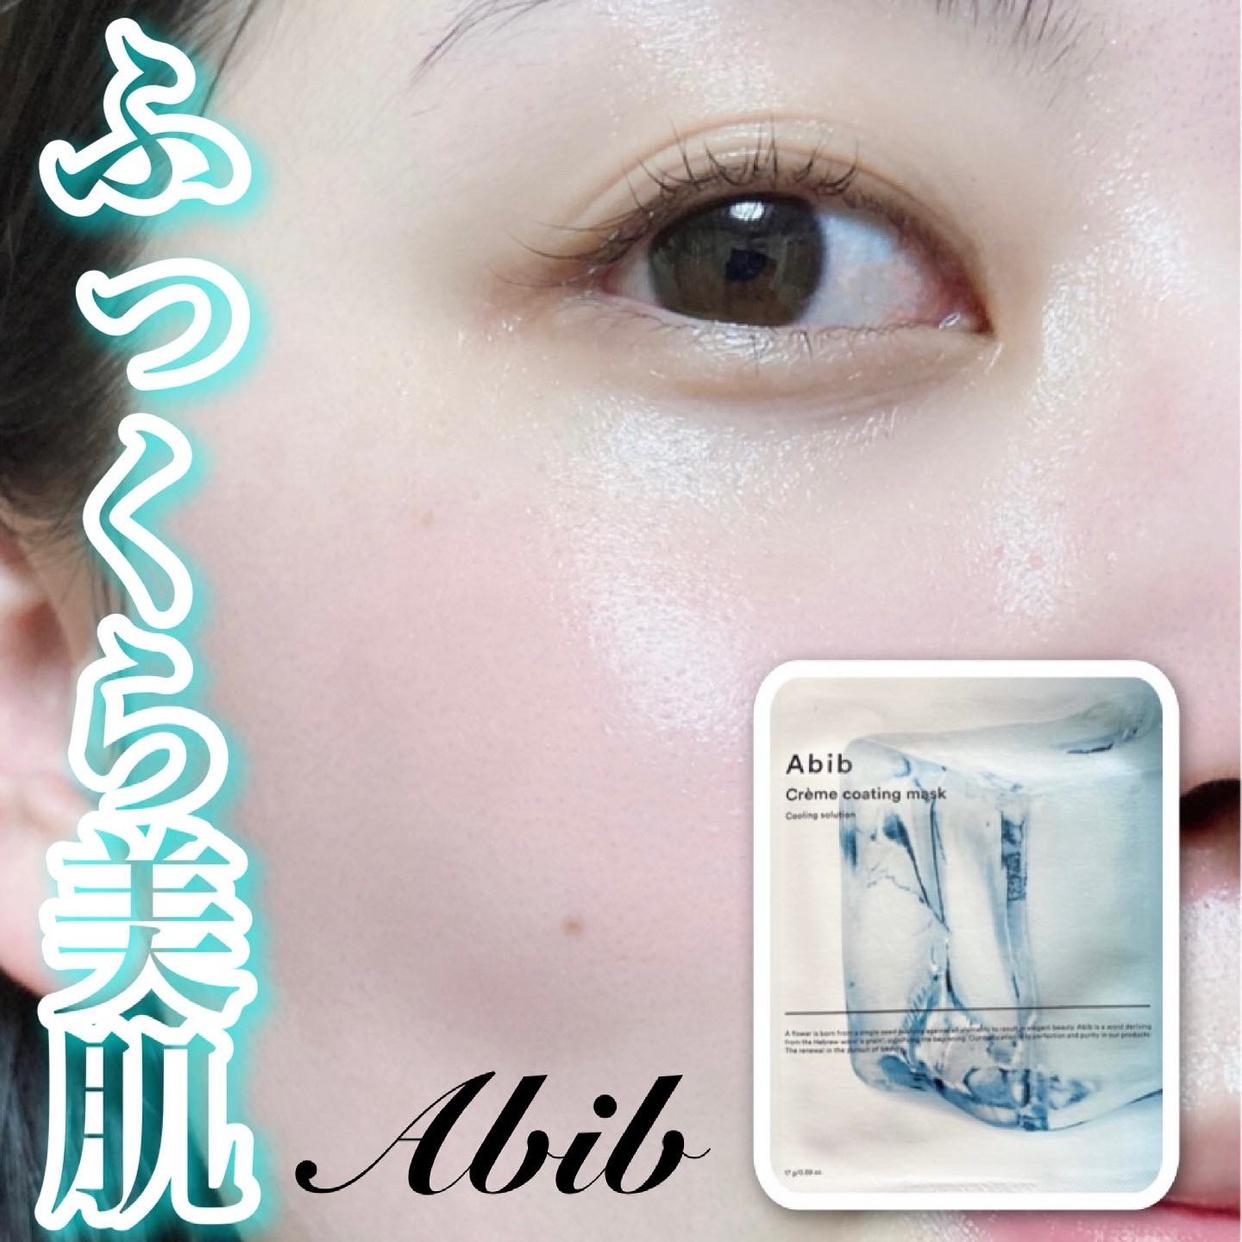 Abib(アビブ) クリームコーティングマスククーリングソリューションの良い点・メリットに関するyunaさんの口コミ画像1